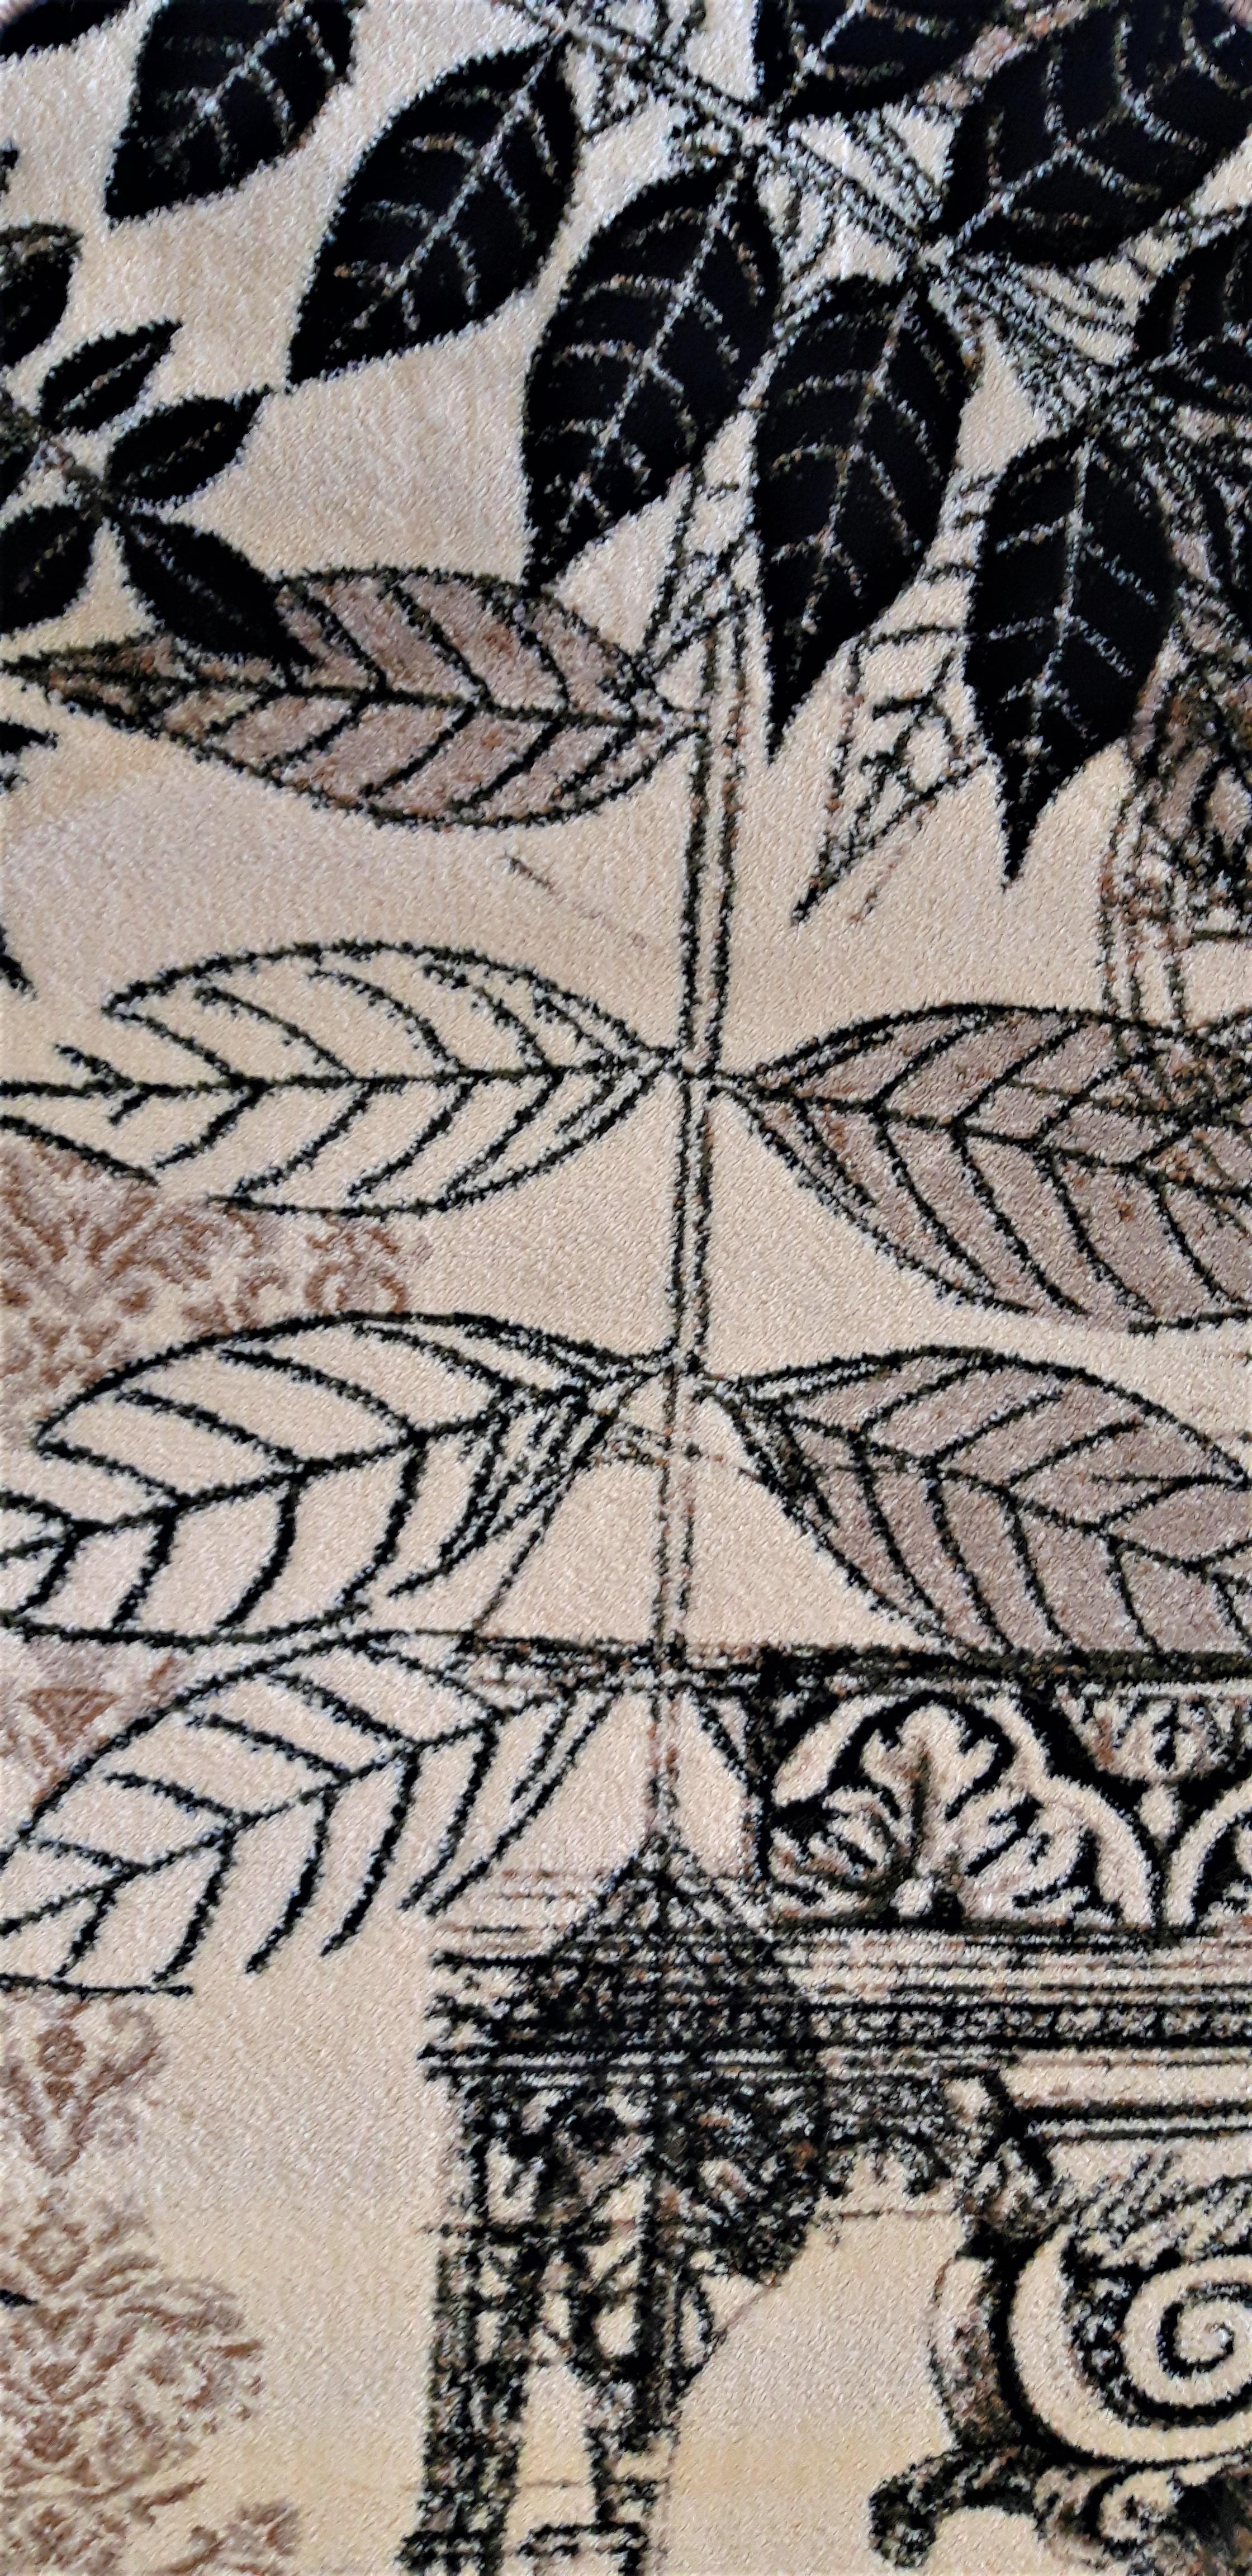 Covor Modern, Lotos Frunze 1545, Crem / Bej / Gri, Oval, 120x170 cm, 1800 gr/mp [4]